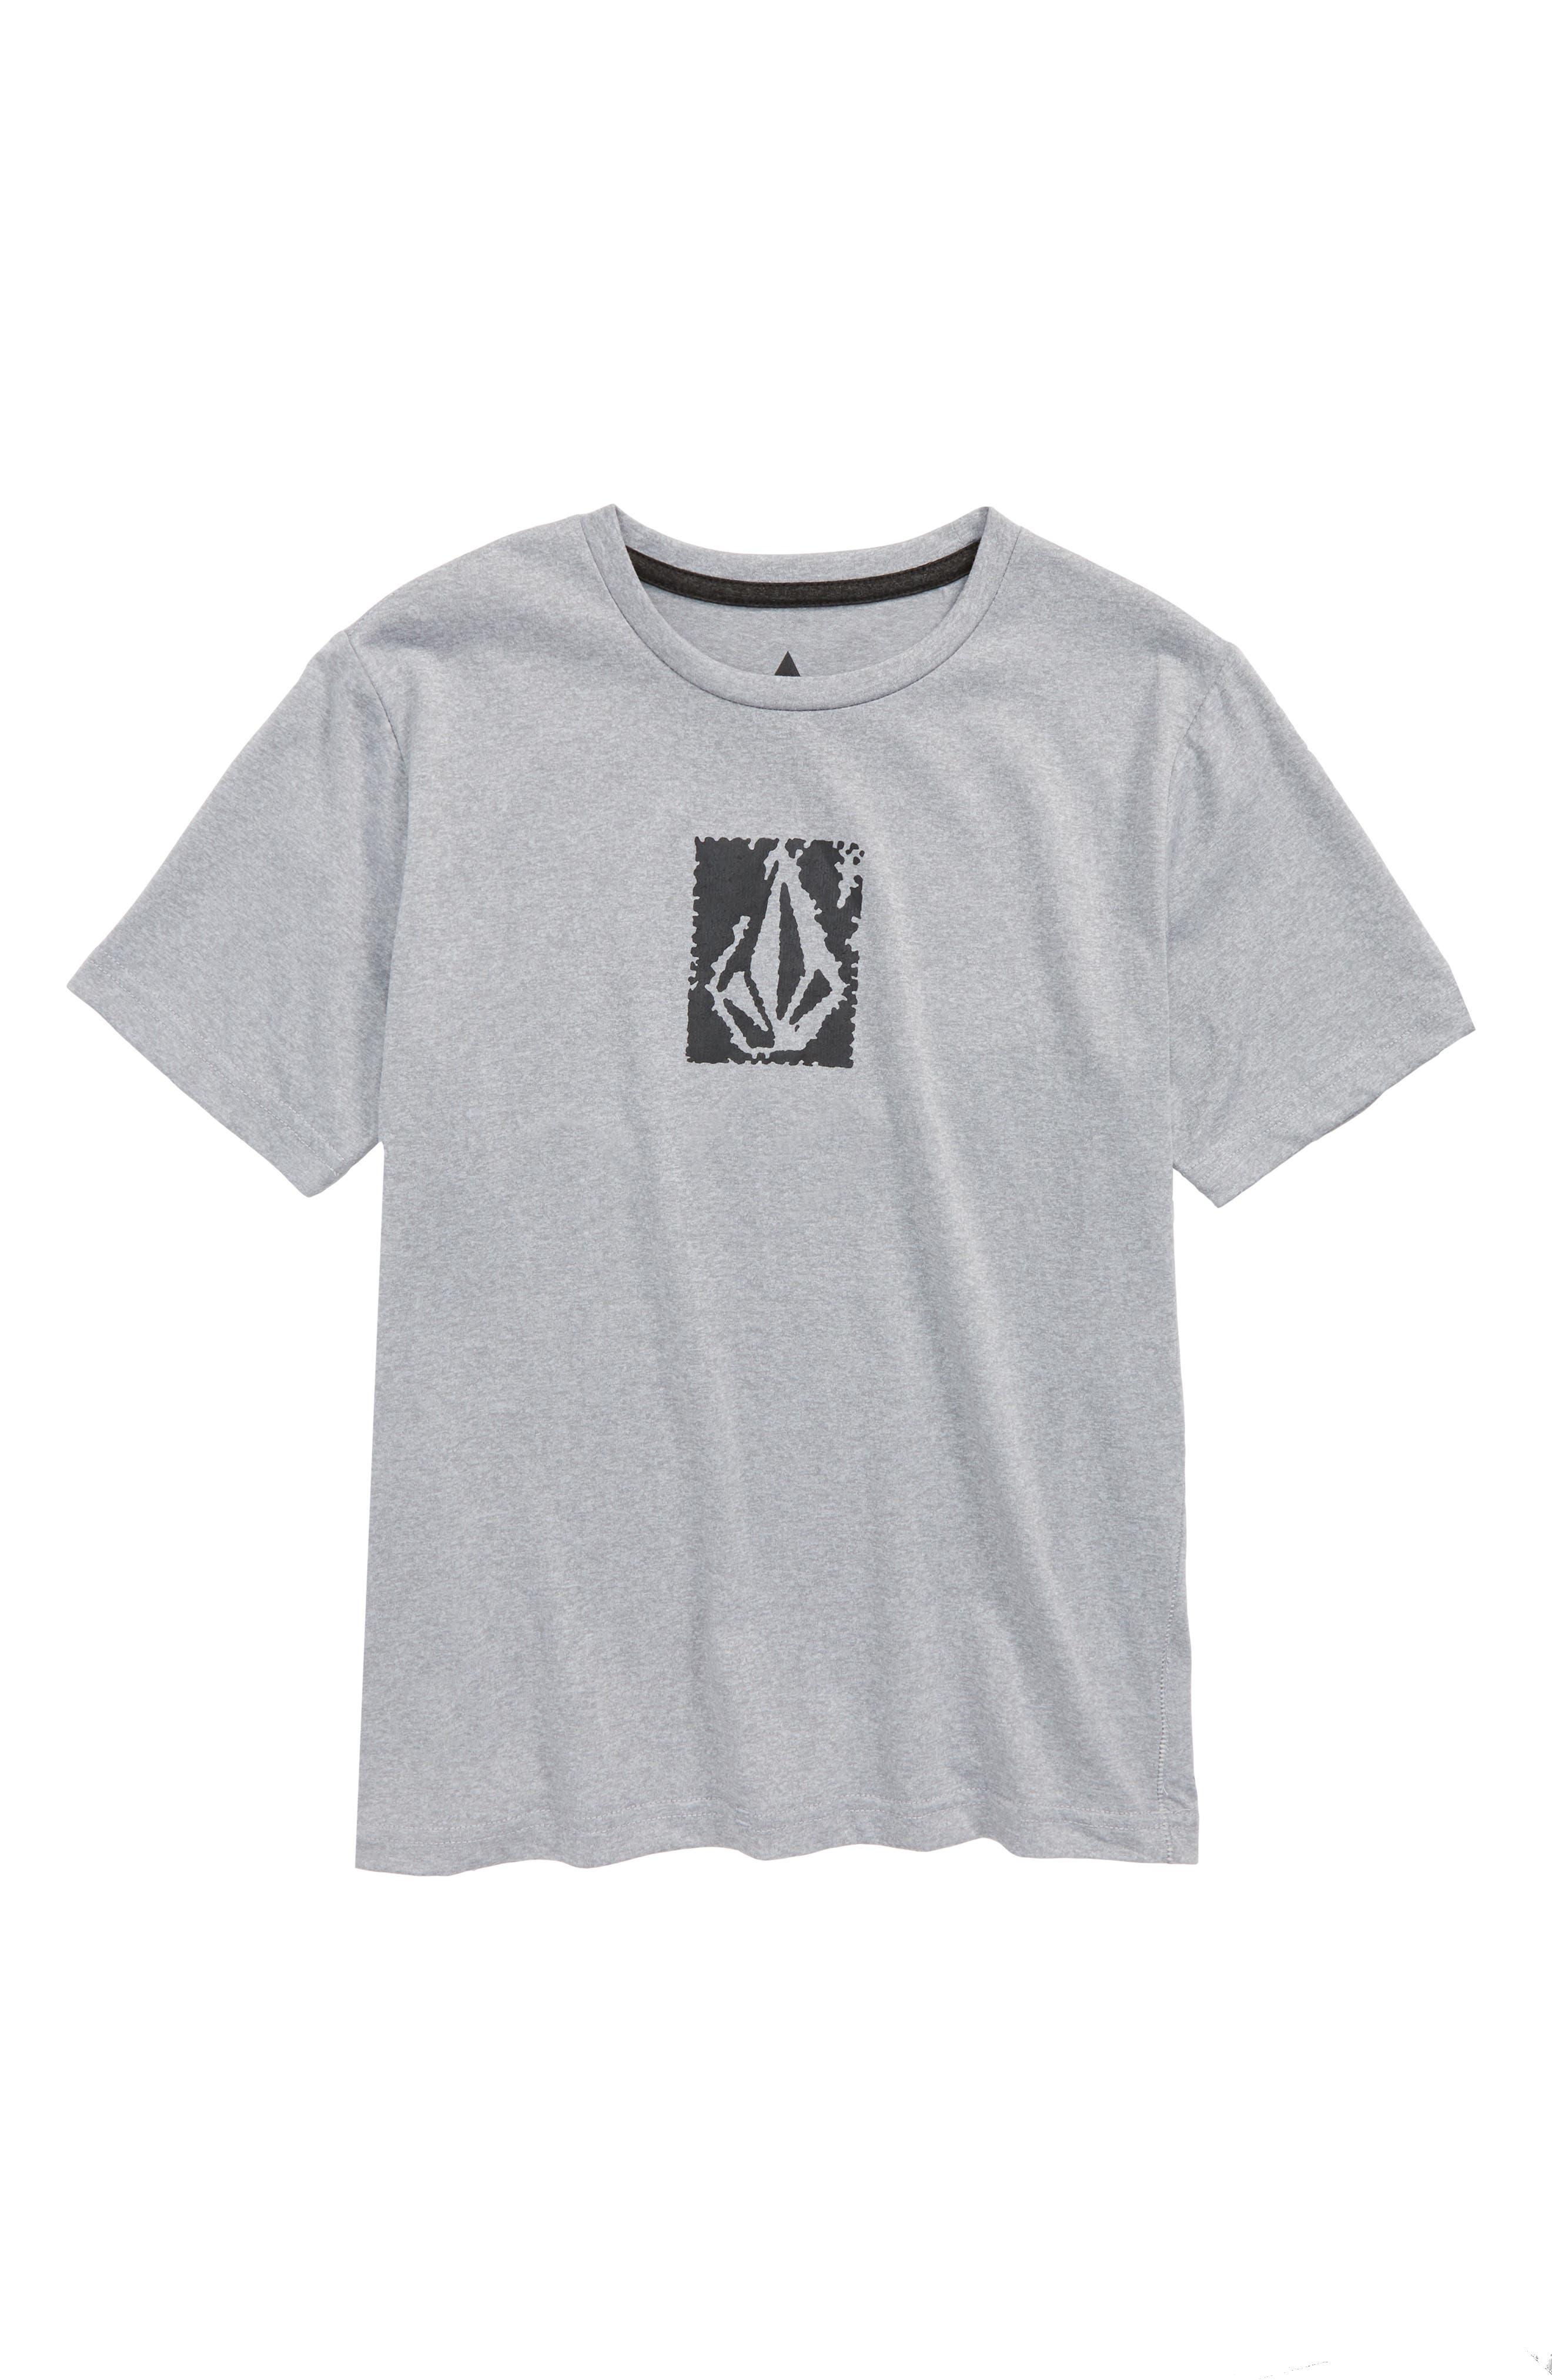 Lido Short Sleeve Rashguard,                         Main,                         color, 020